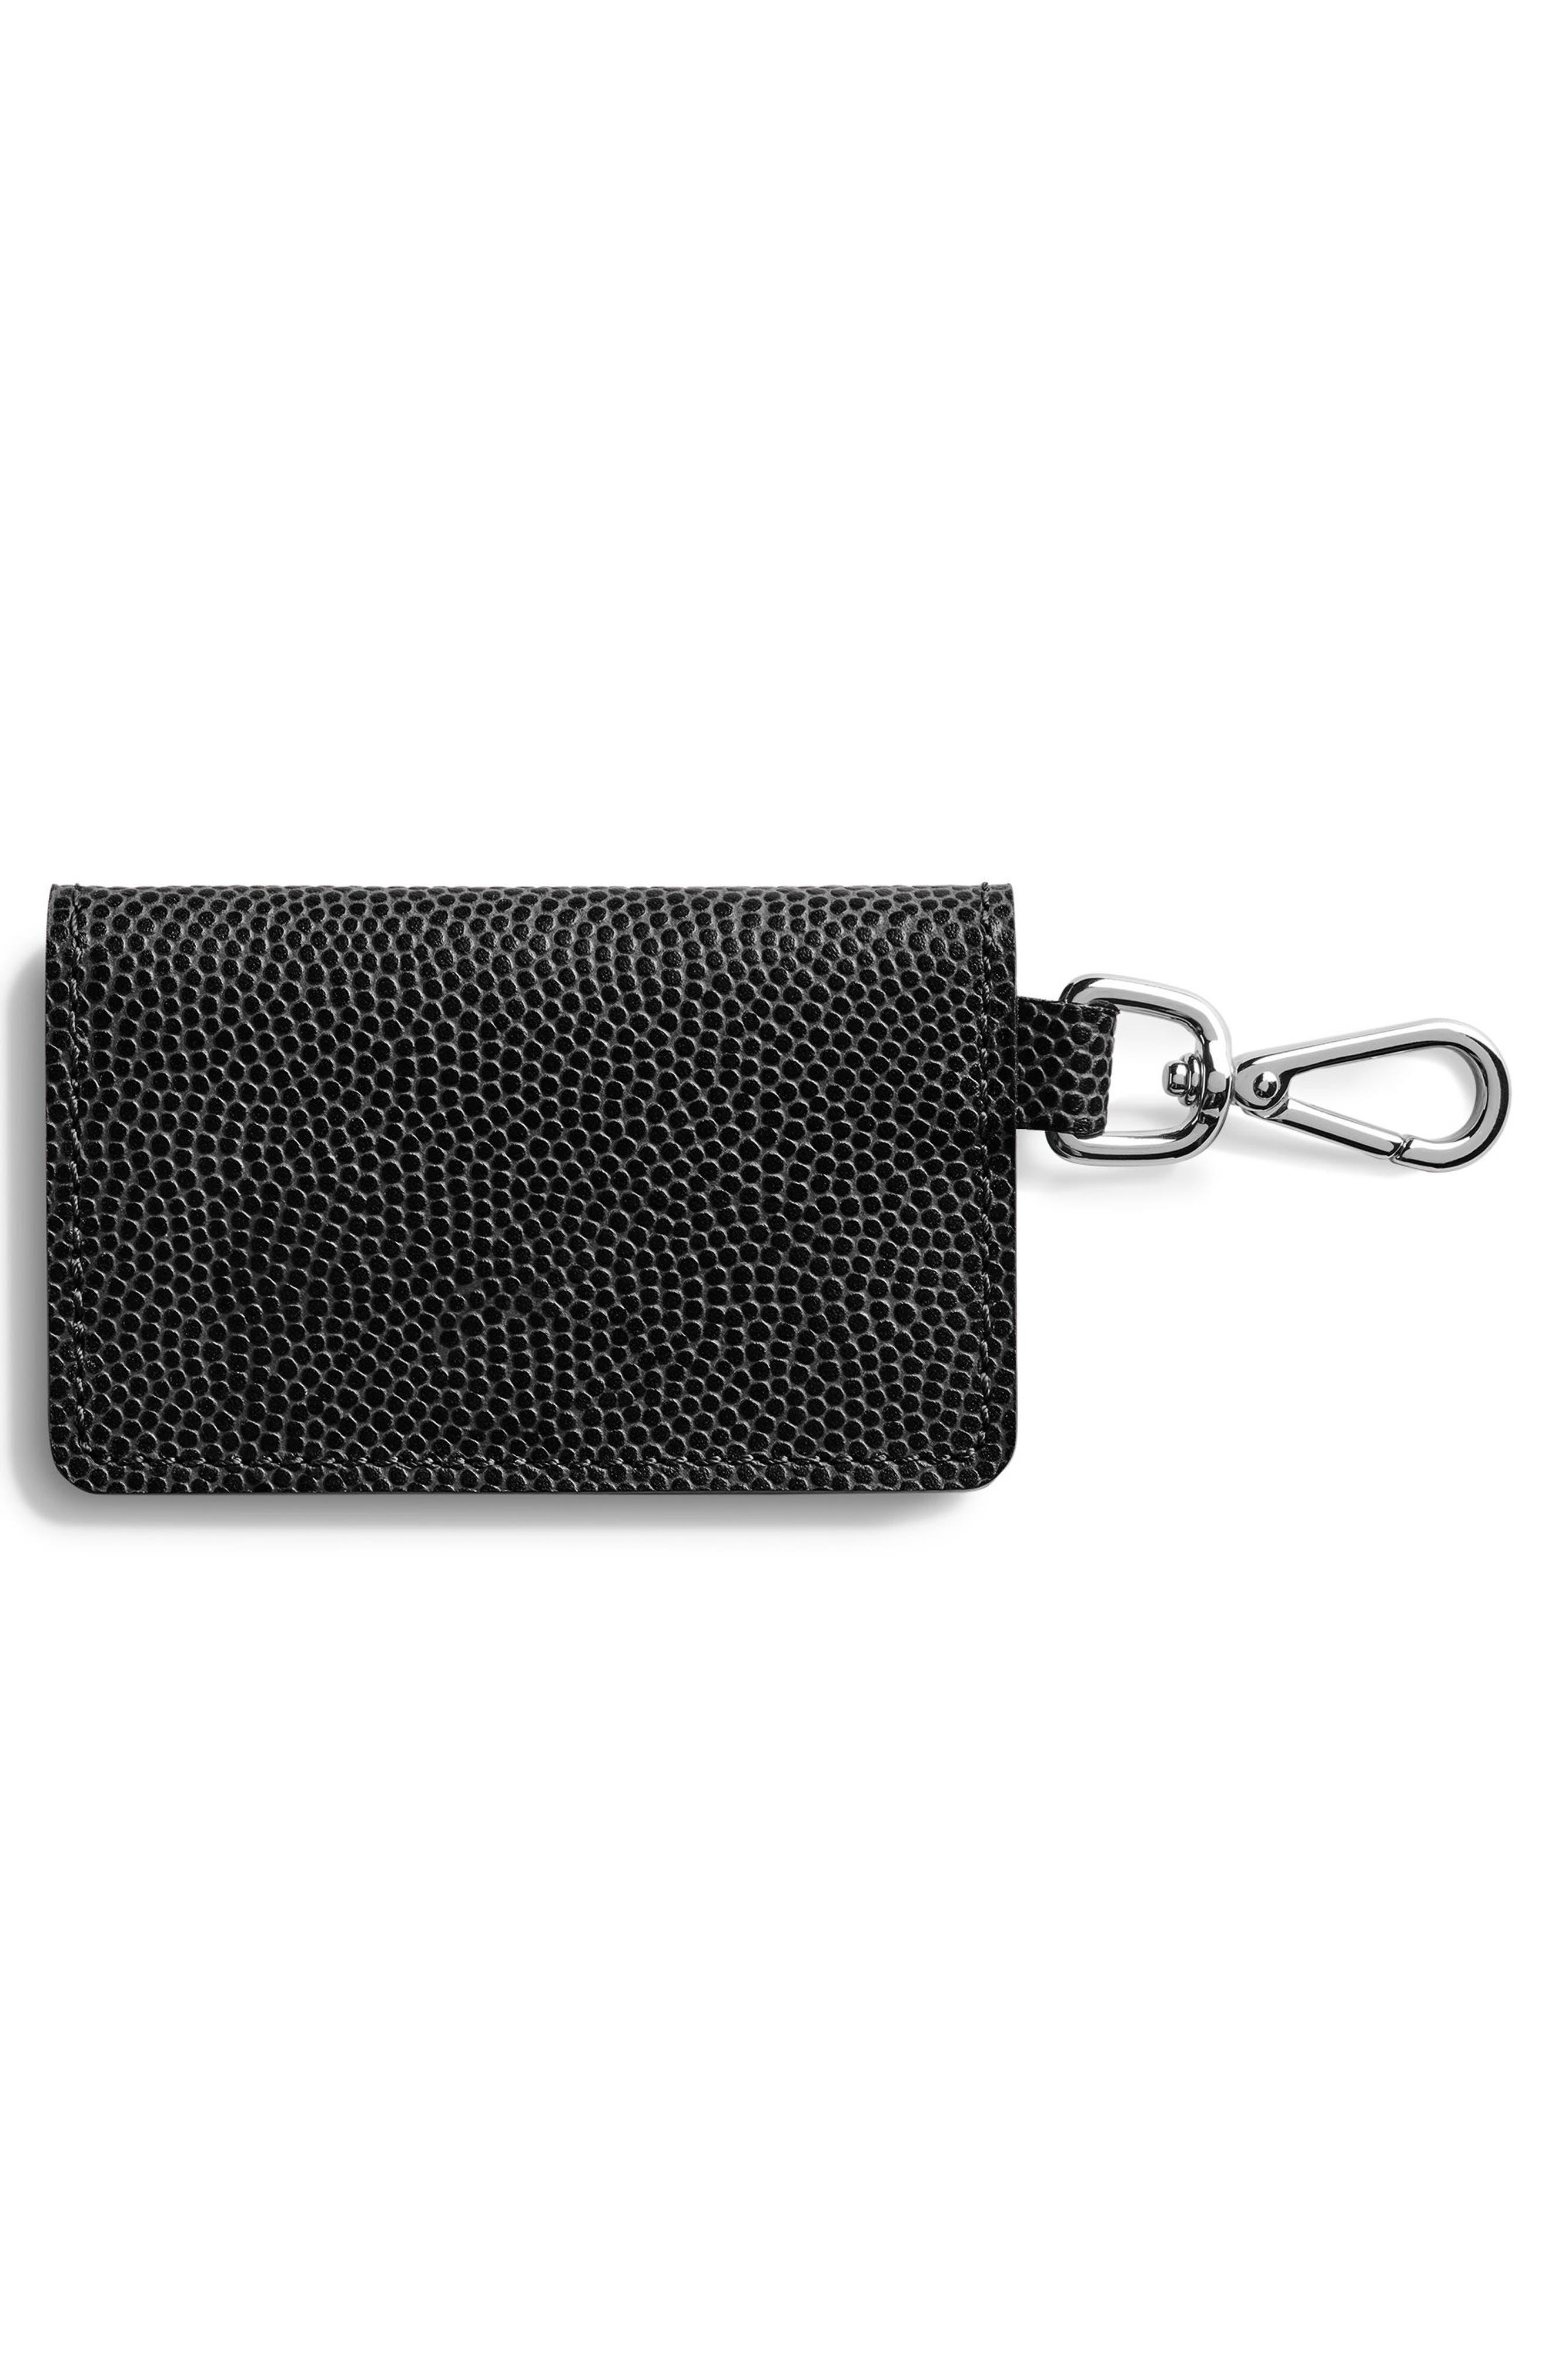 Latigo Leather Card Case,                             Alternate thumbnail 3, color,                             Black